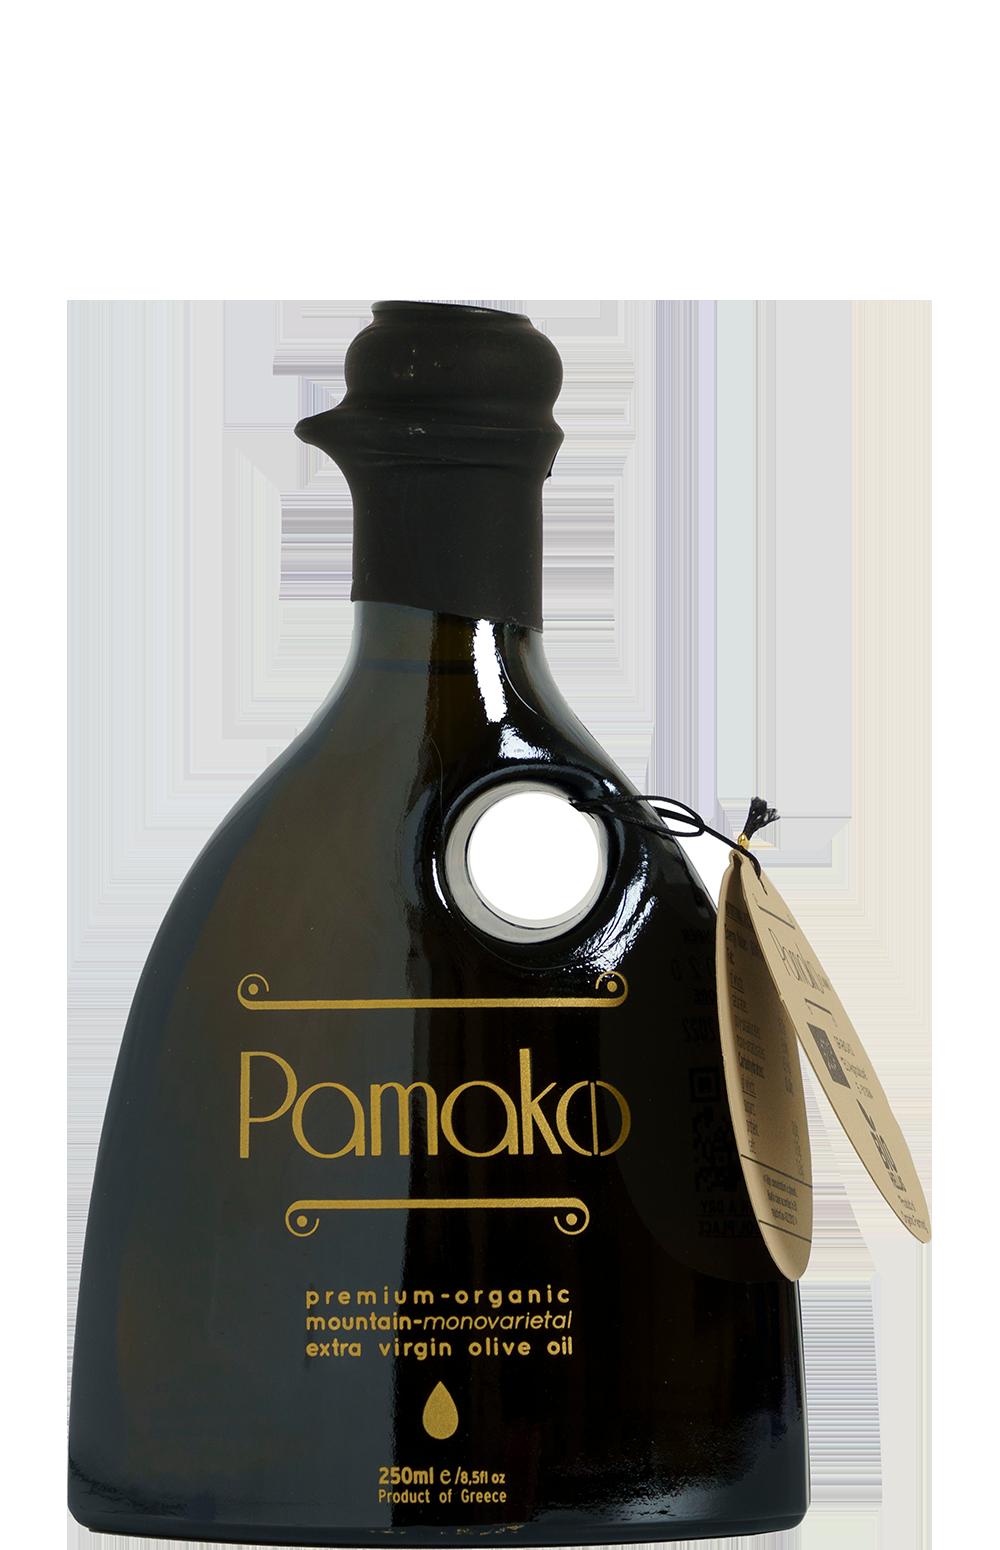 Pamako Premium Organic Mountain Blend